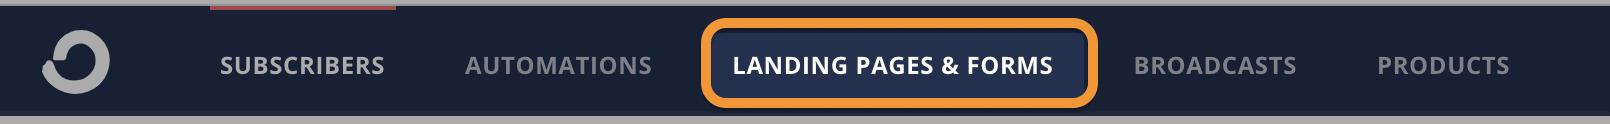 landing pages top menu